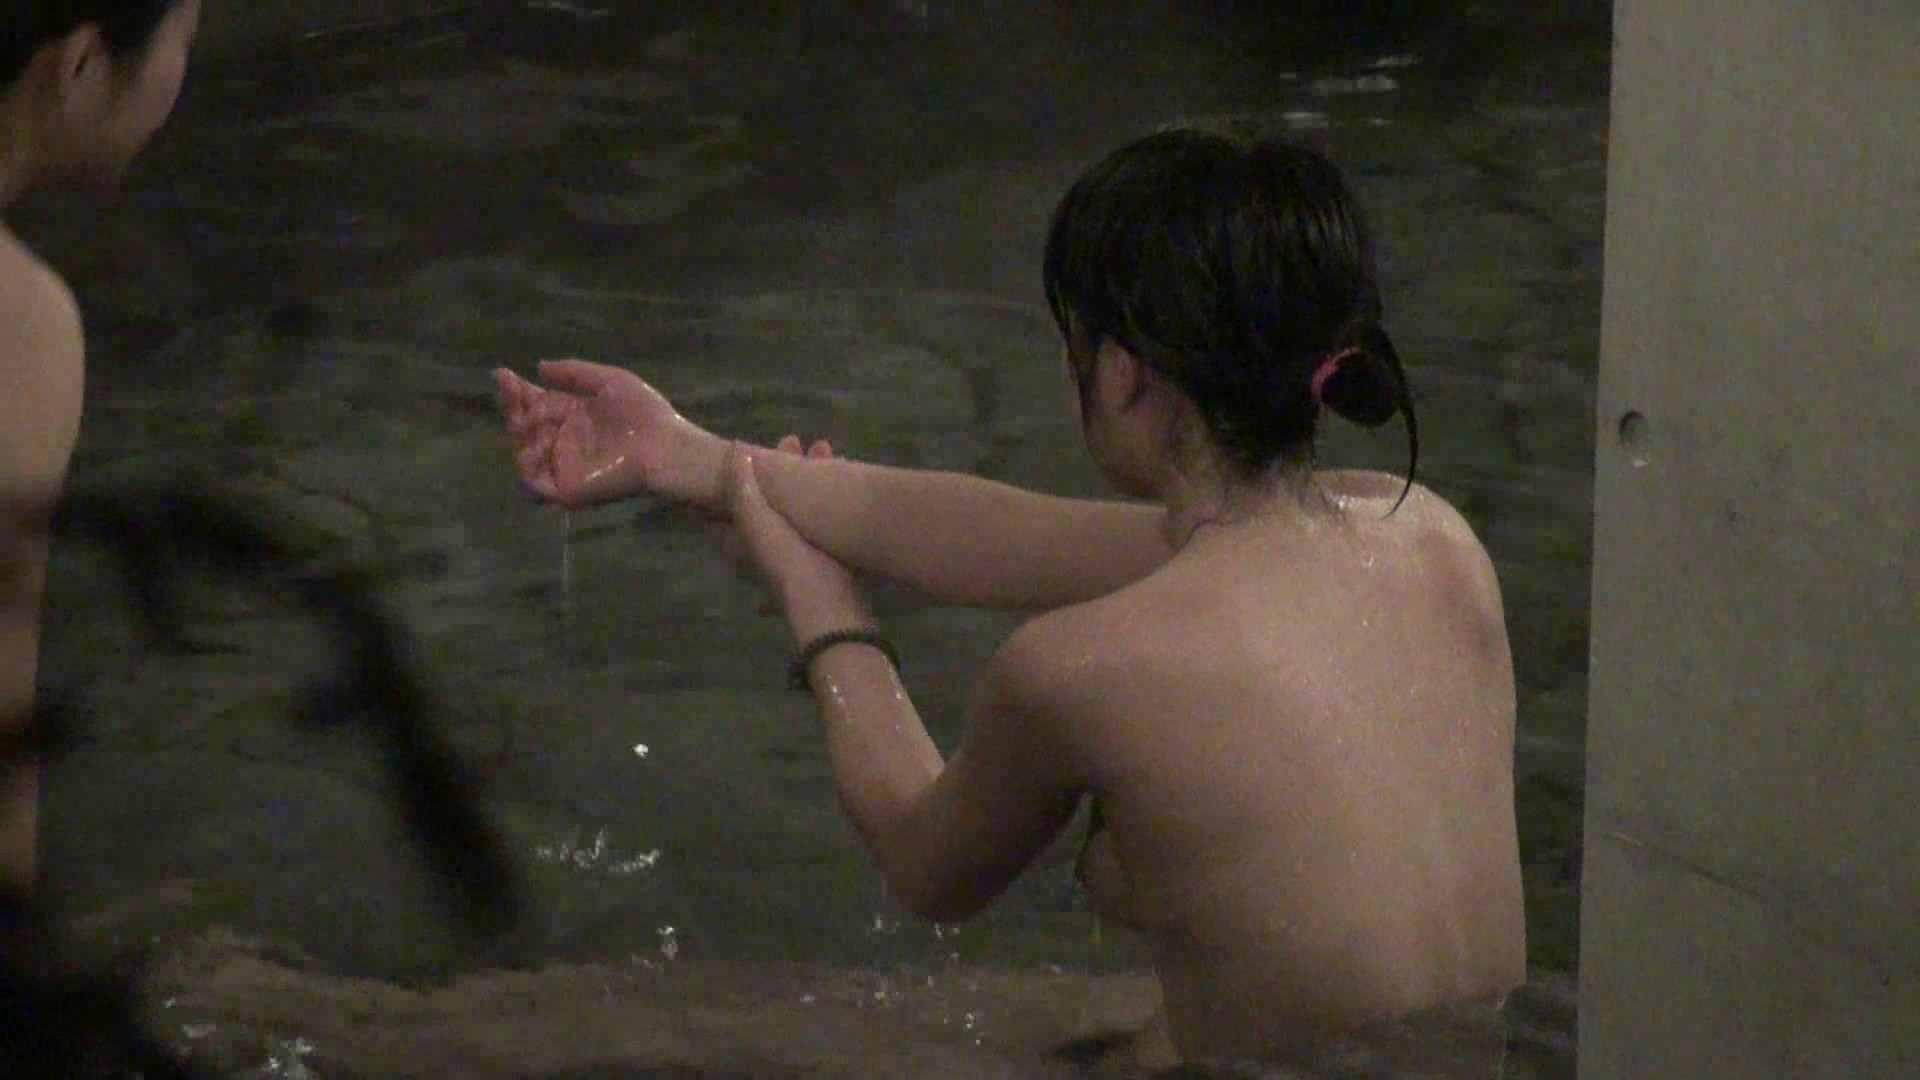 Aquaな露天風呂Vol.343 露天風呂 AV無料動画キャプチャ 92連発 8